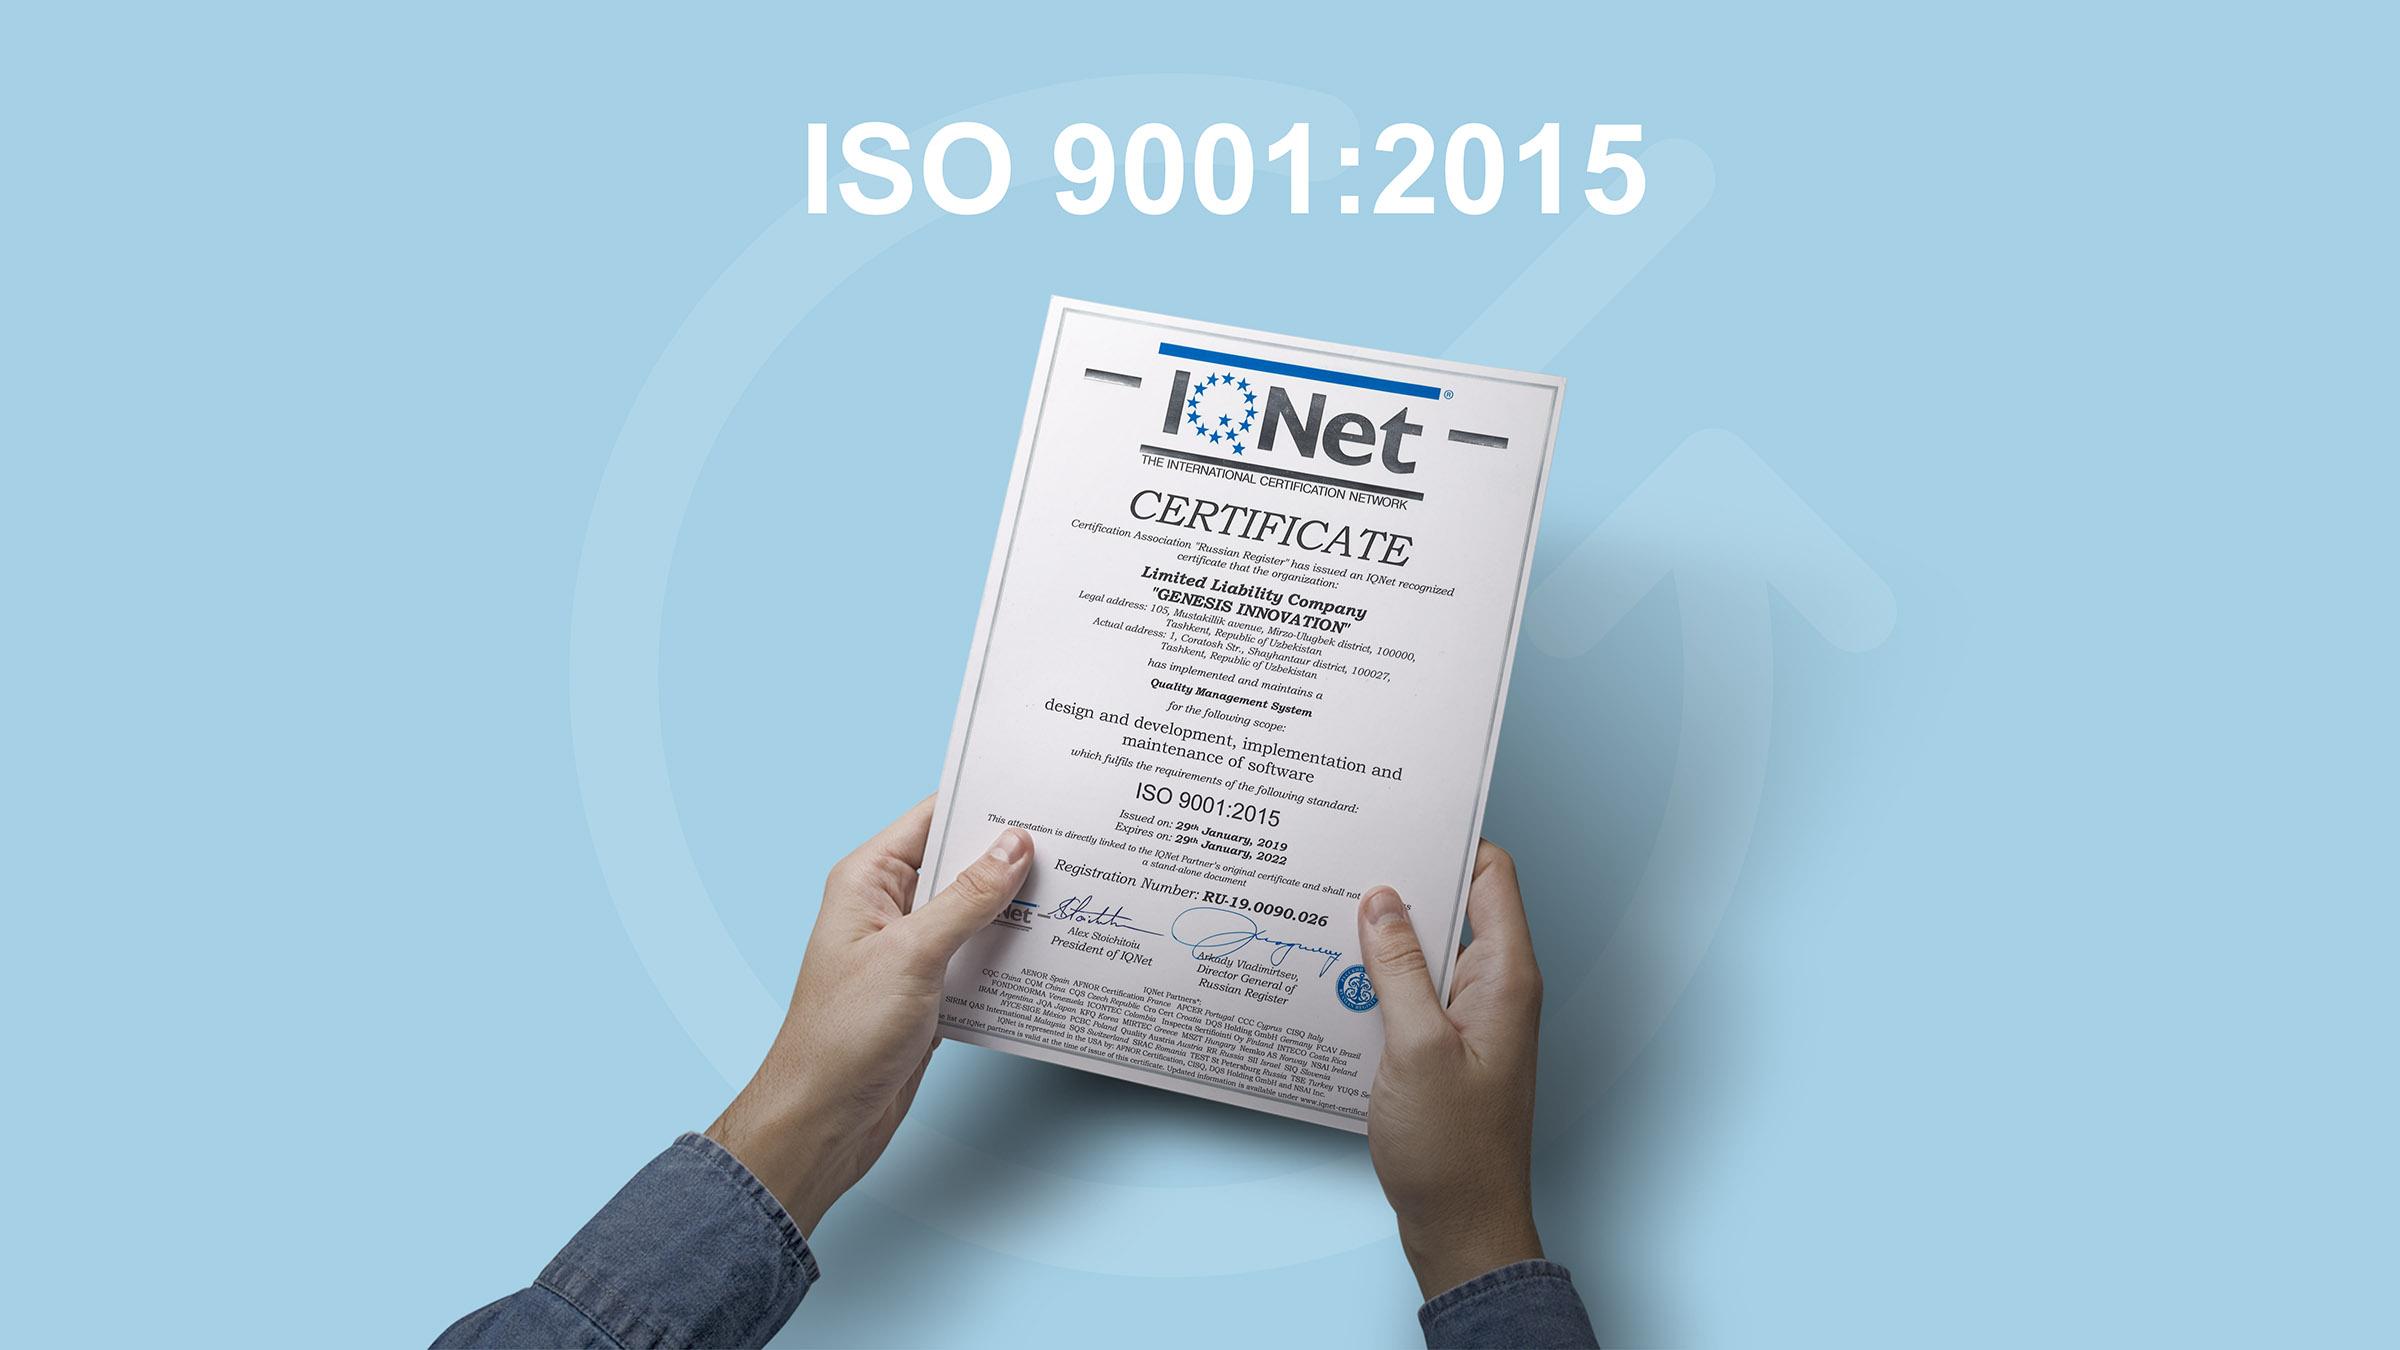 ISO 9001:2015 sifat menedjmenti tizimi